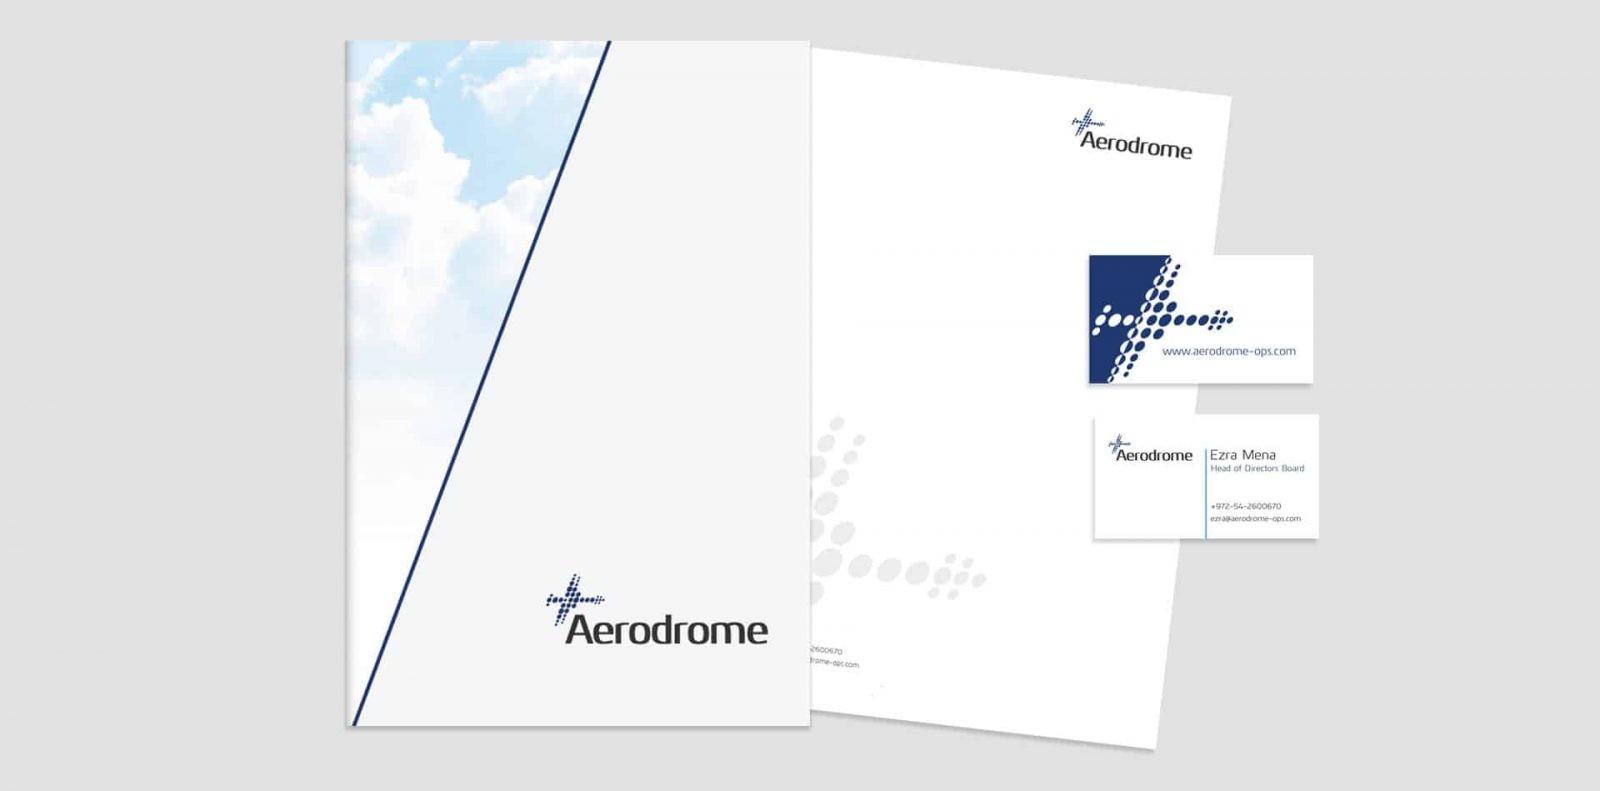 aerodrome-strip-1